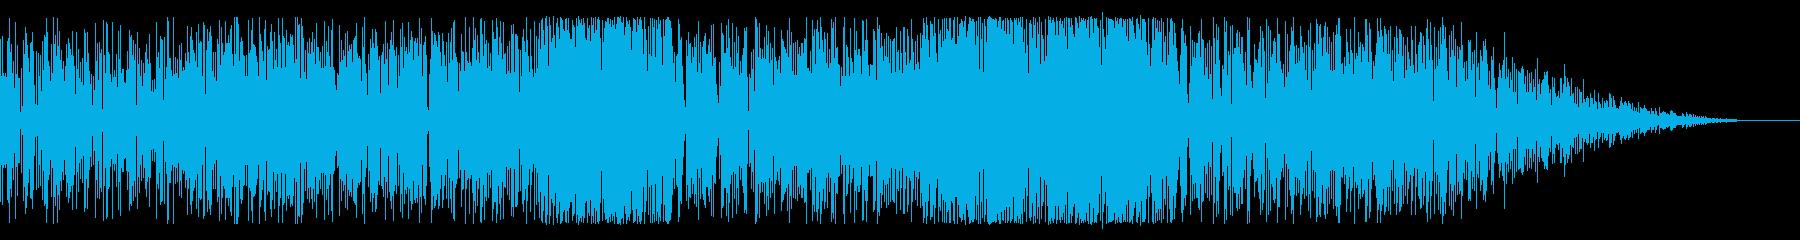 Latin サスペンス アクション...の再生済みの波形